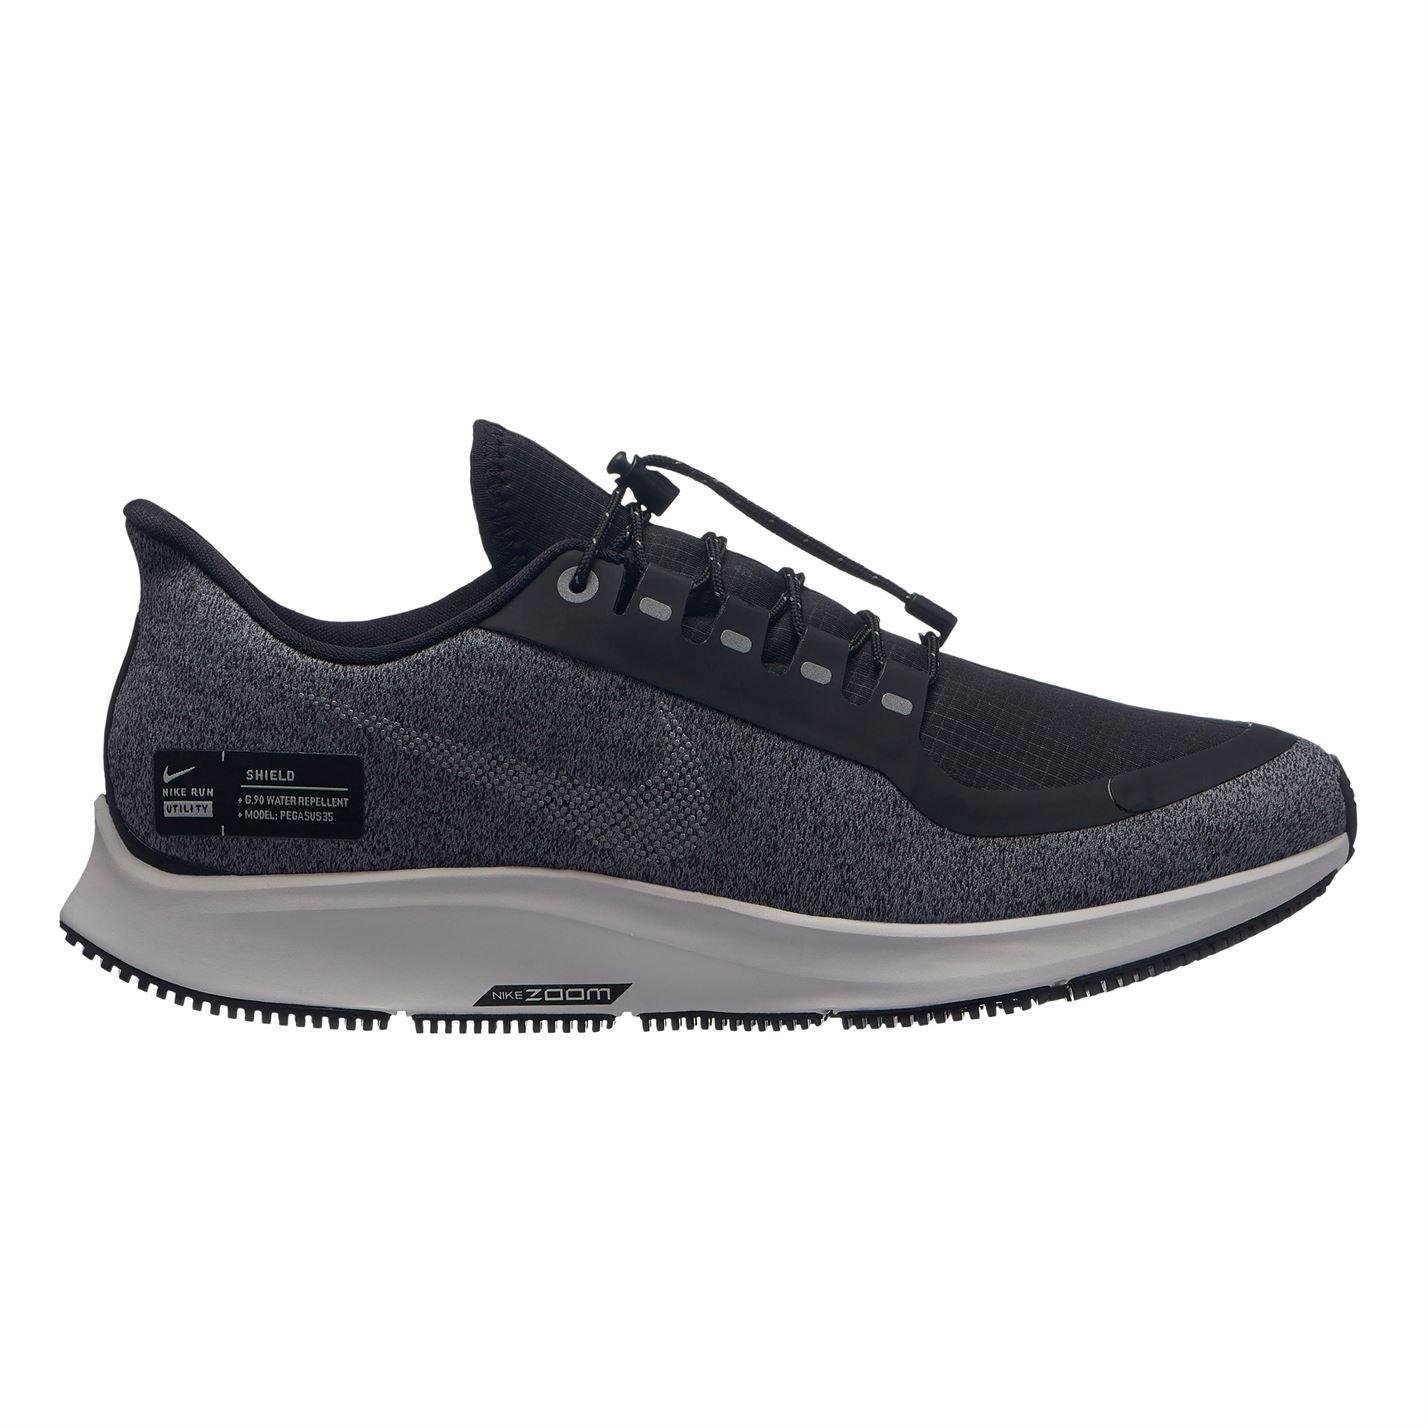 boty Nike Zoom Pegasus 35 Shield dámské Running Shoes